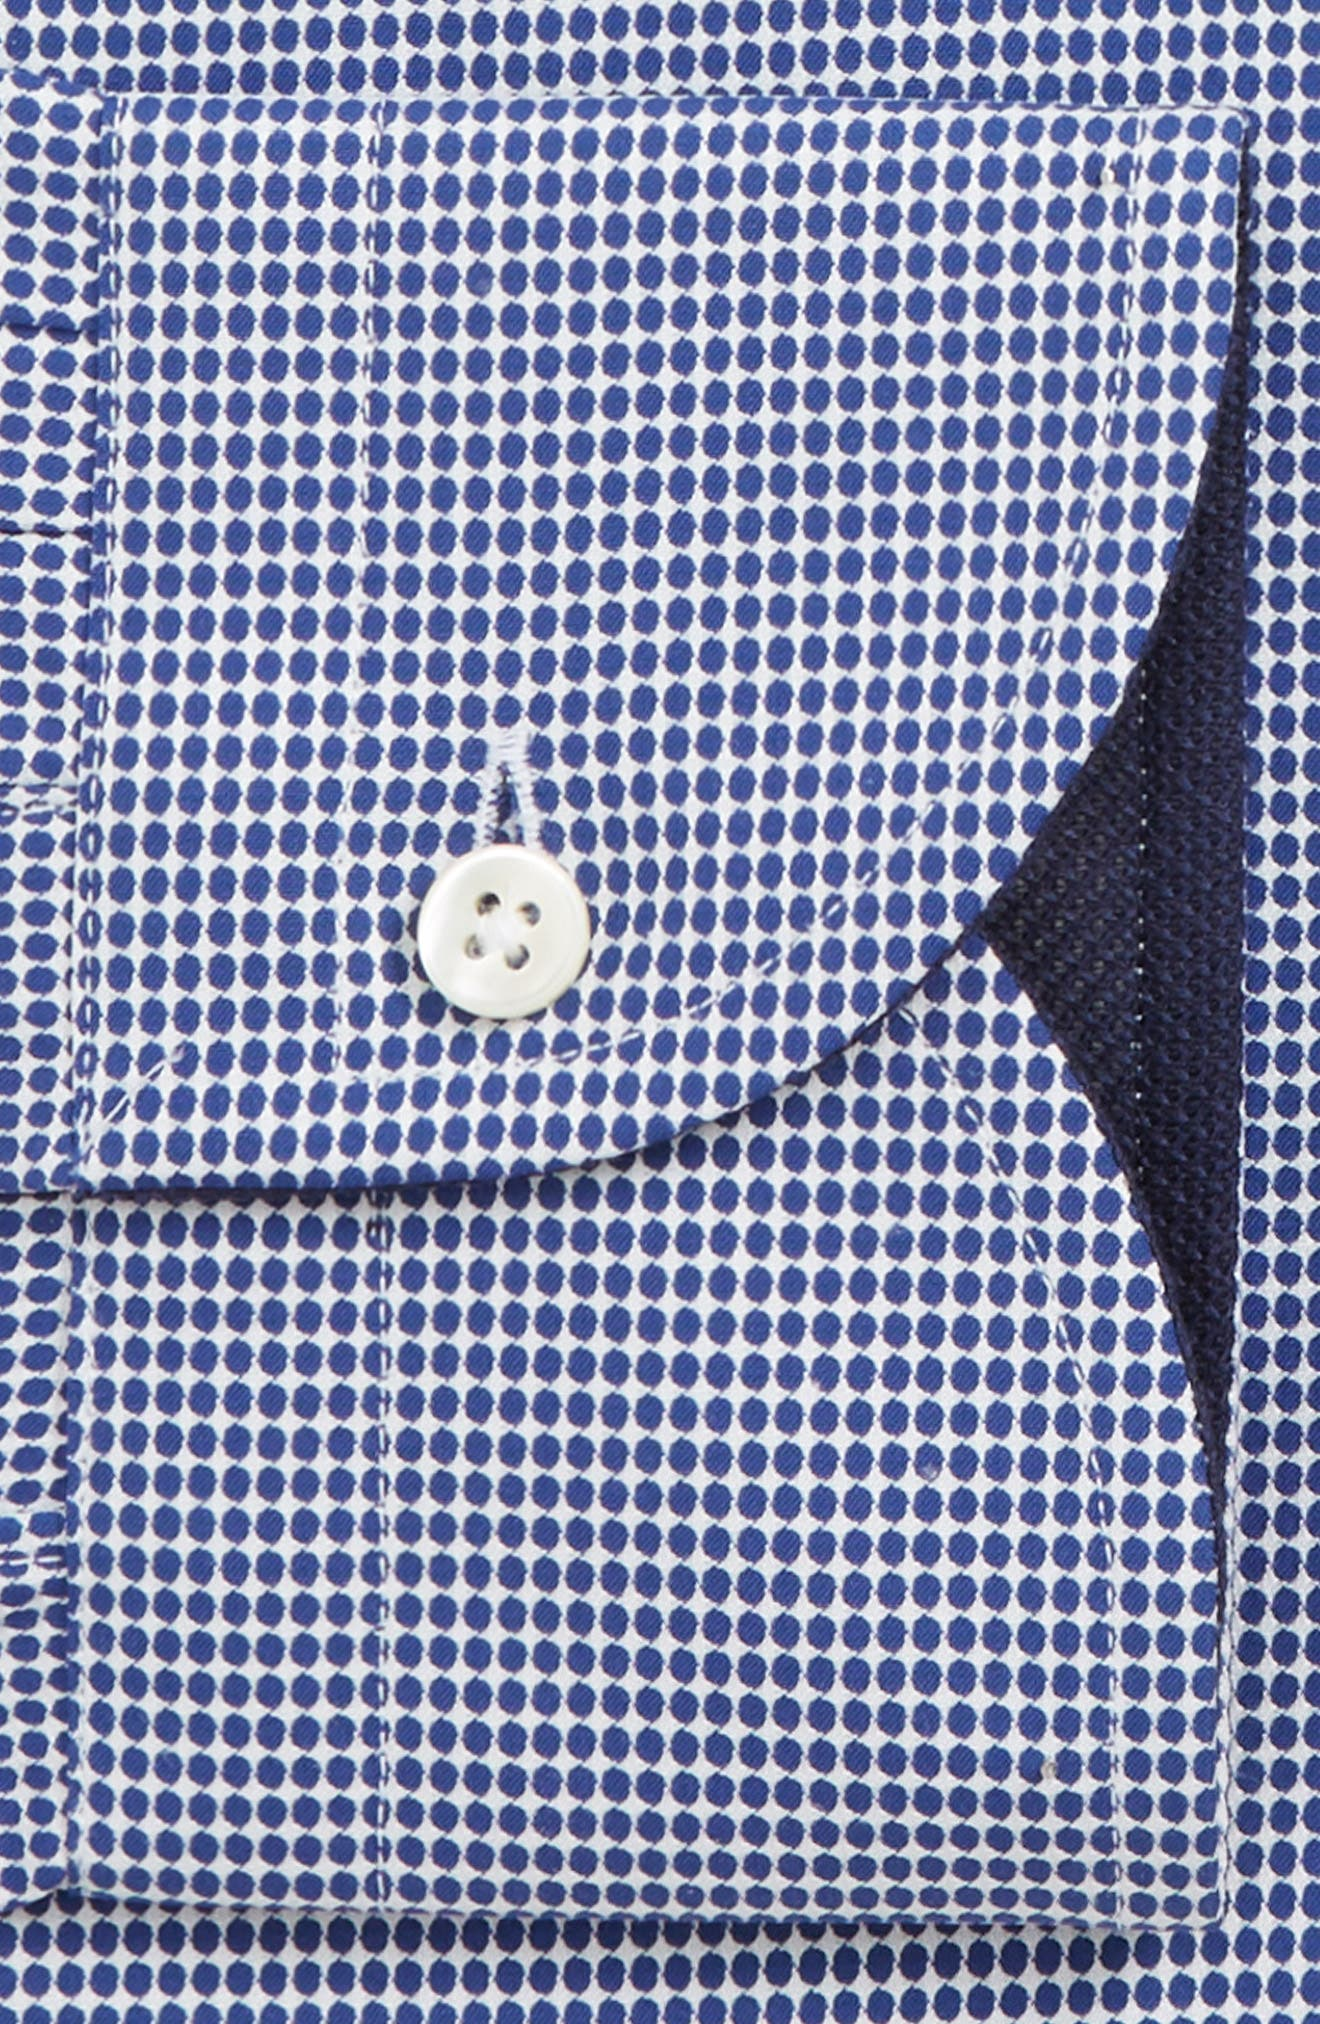 Slim Fit Dot Dress Shirt,                             Alternate thumbnail 7, color,                             NAVY